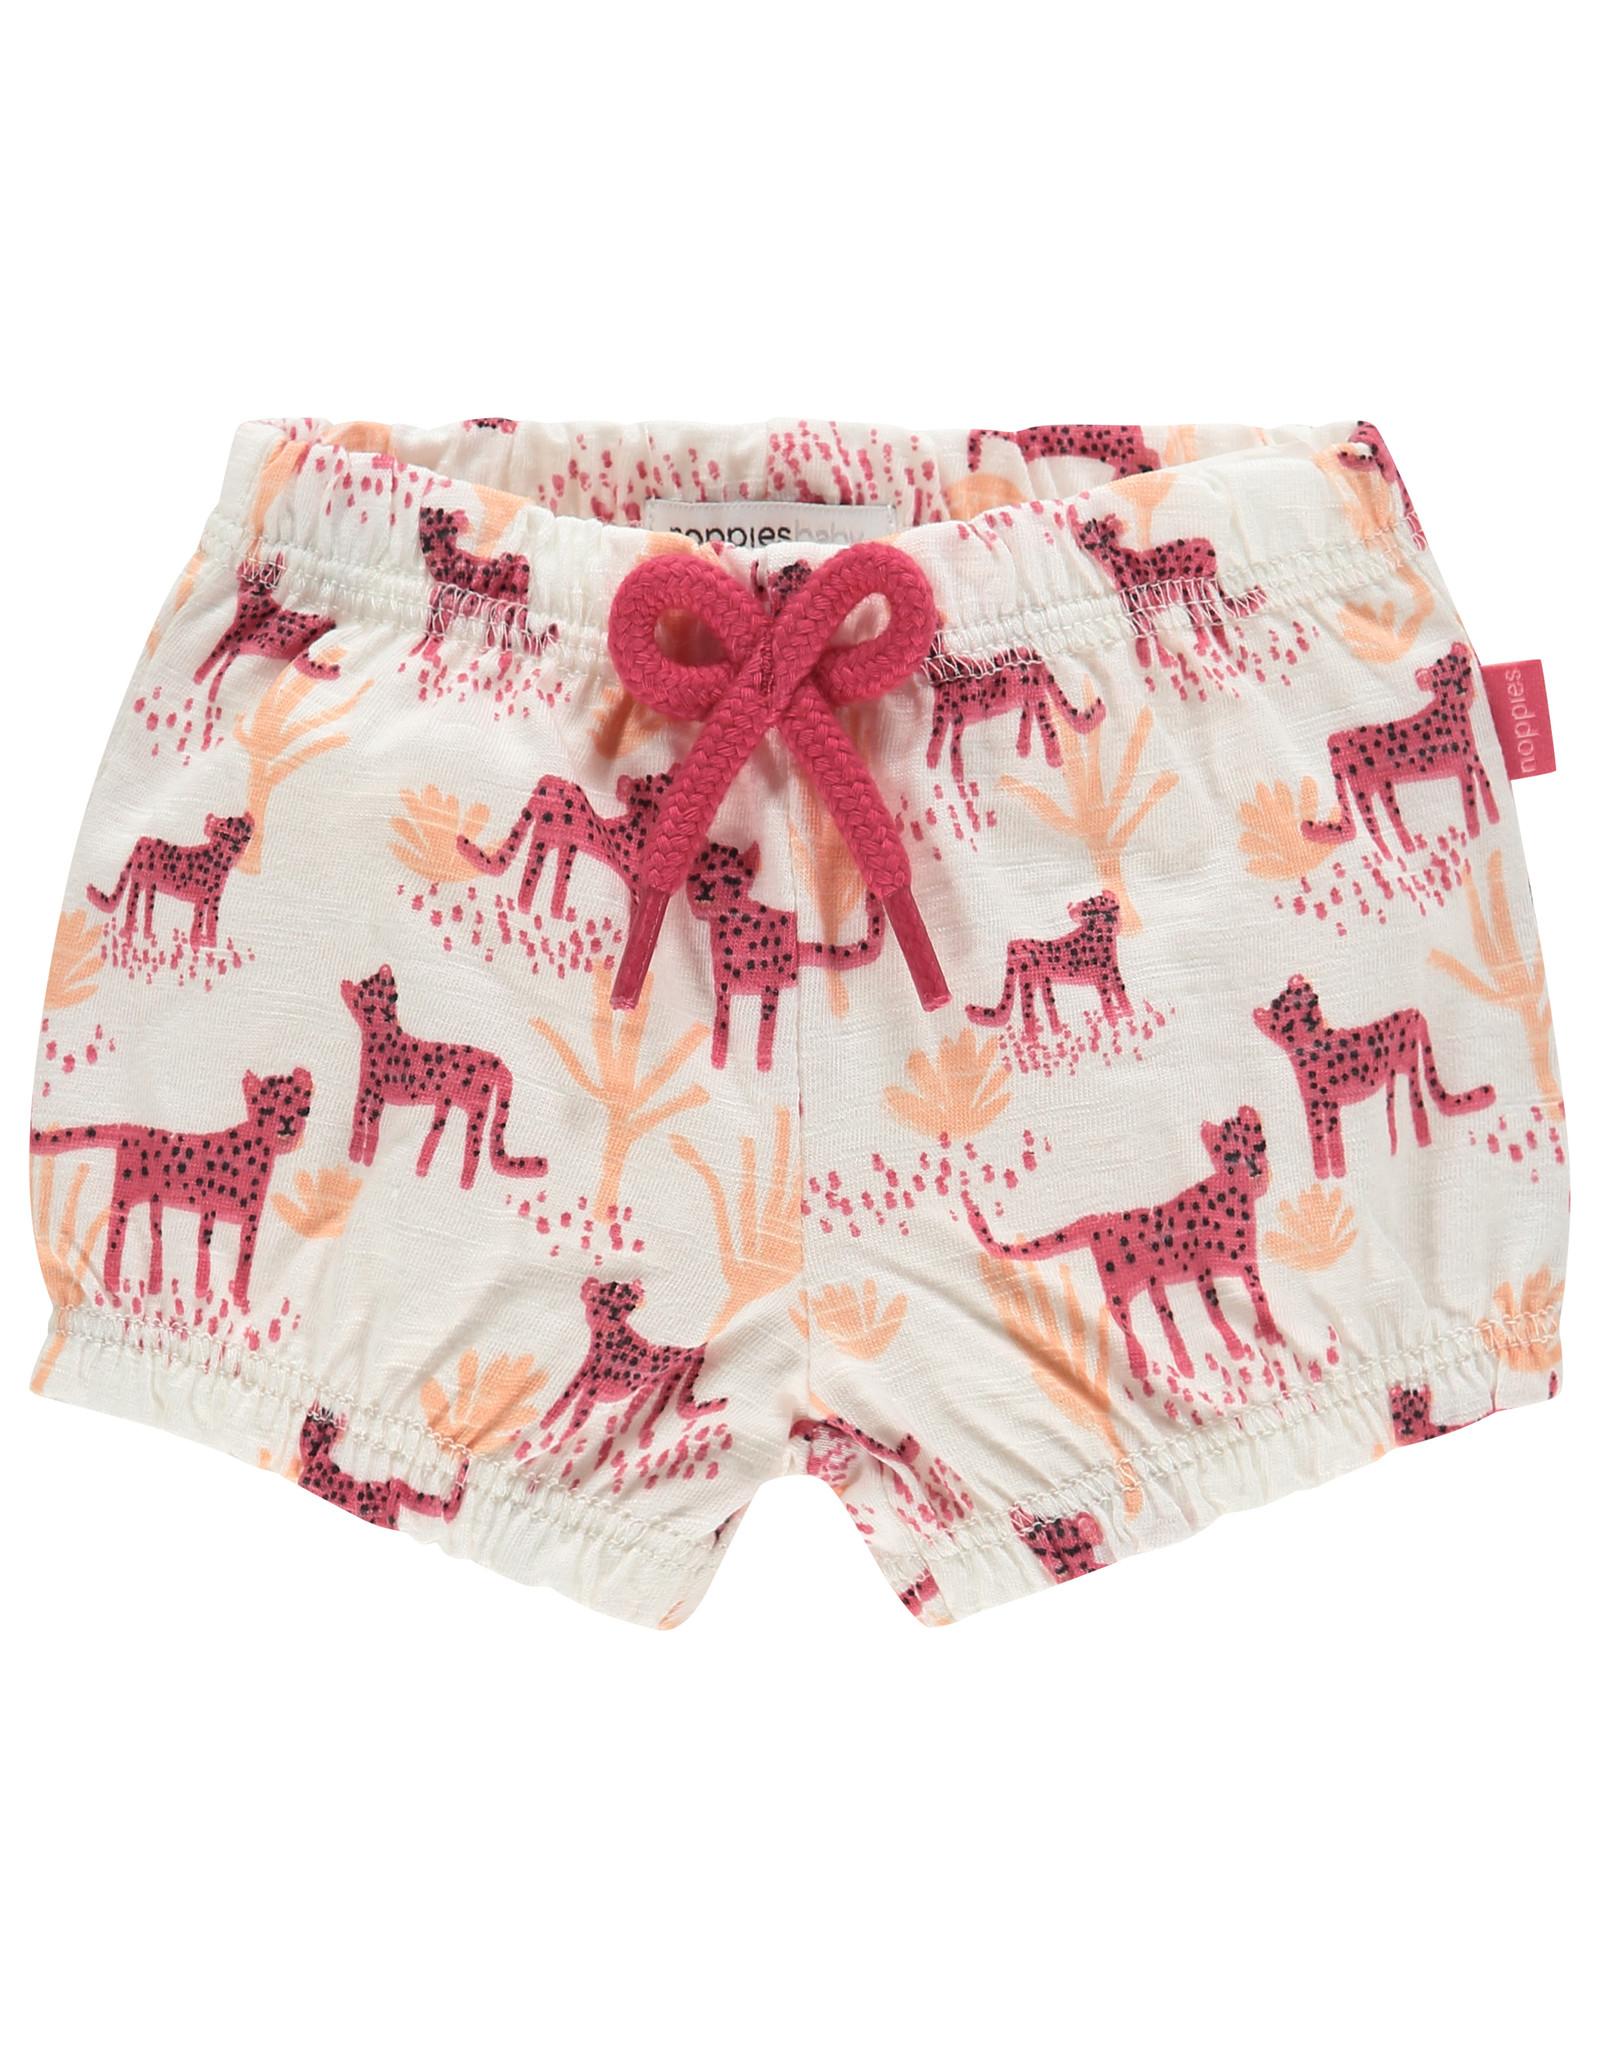 Noppies G Diaper short Cranston aop, Rouge Red